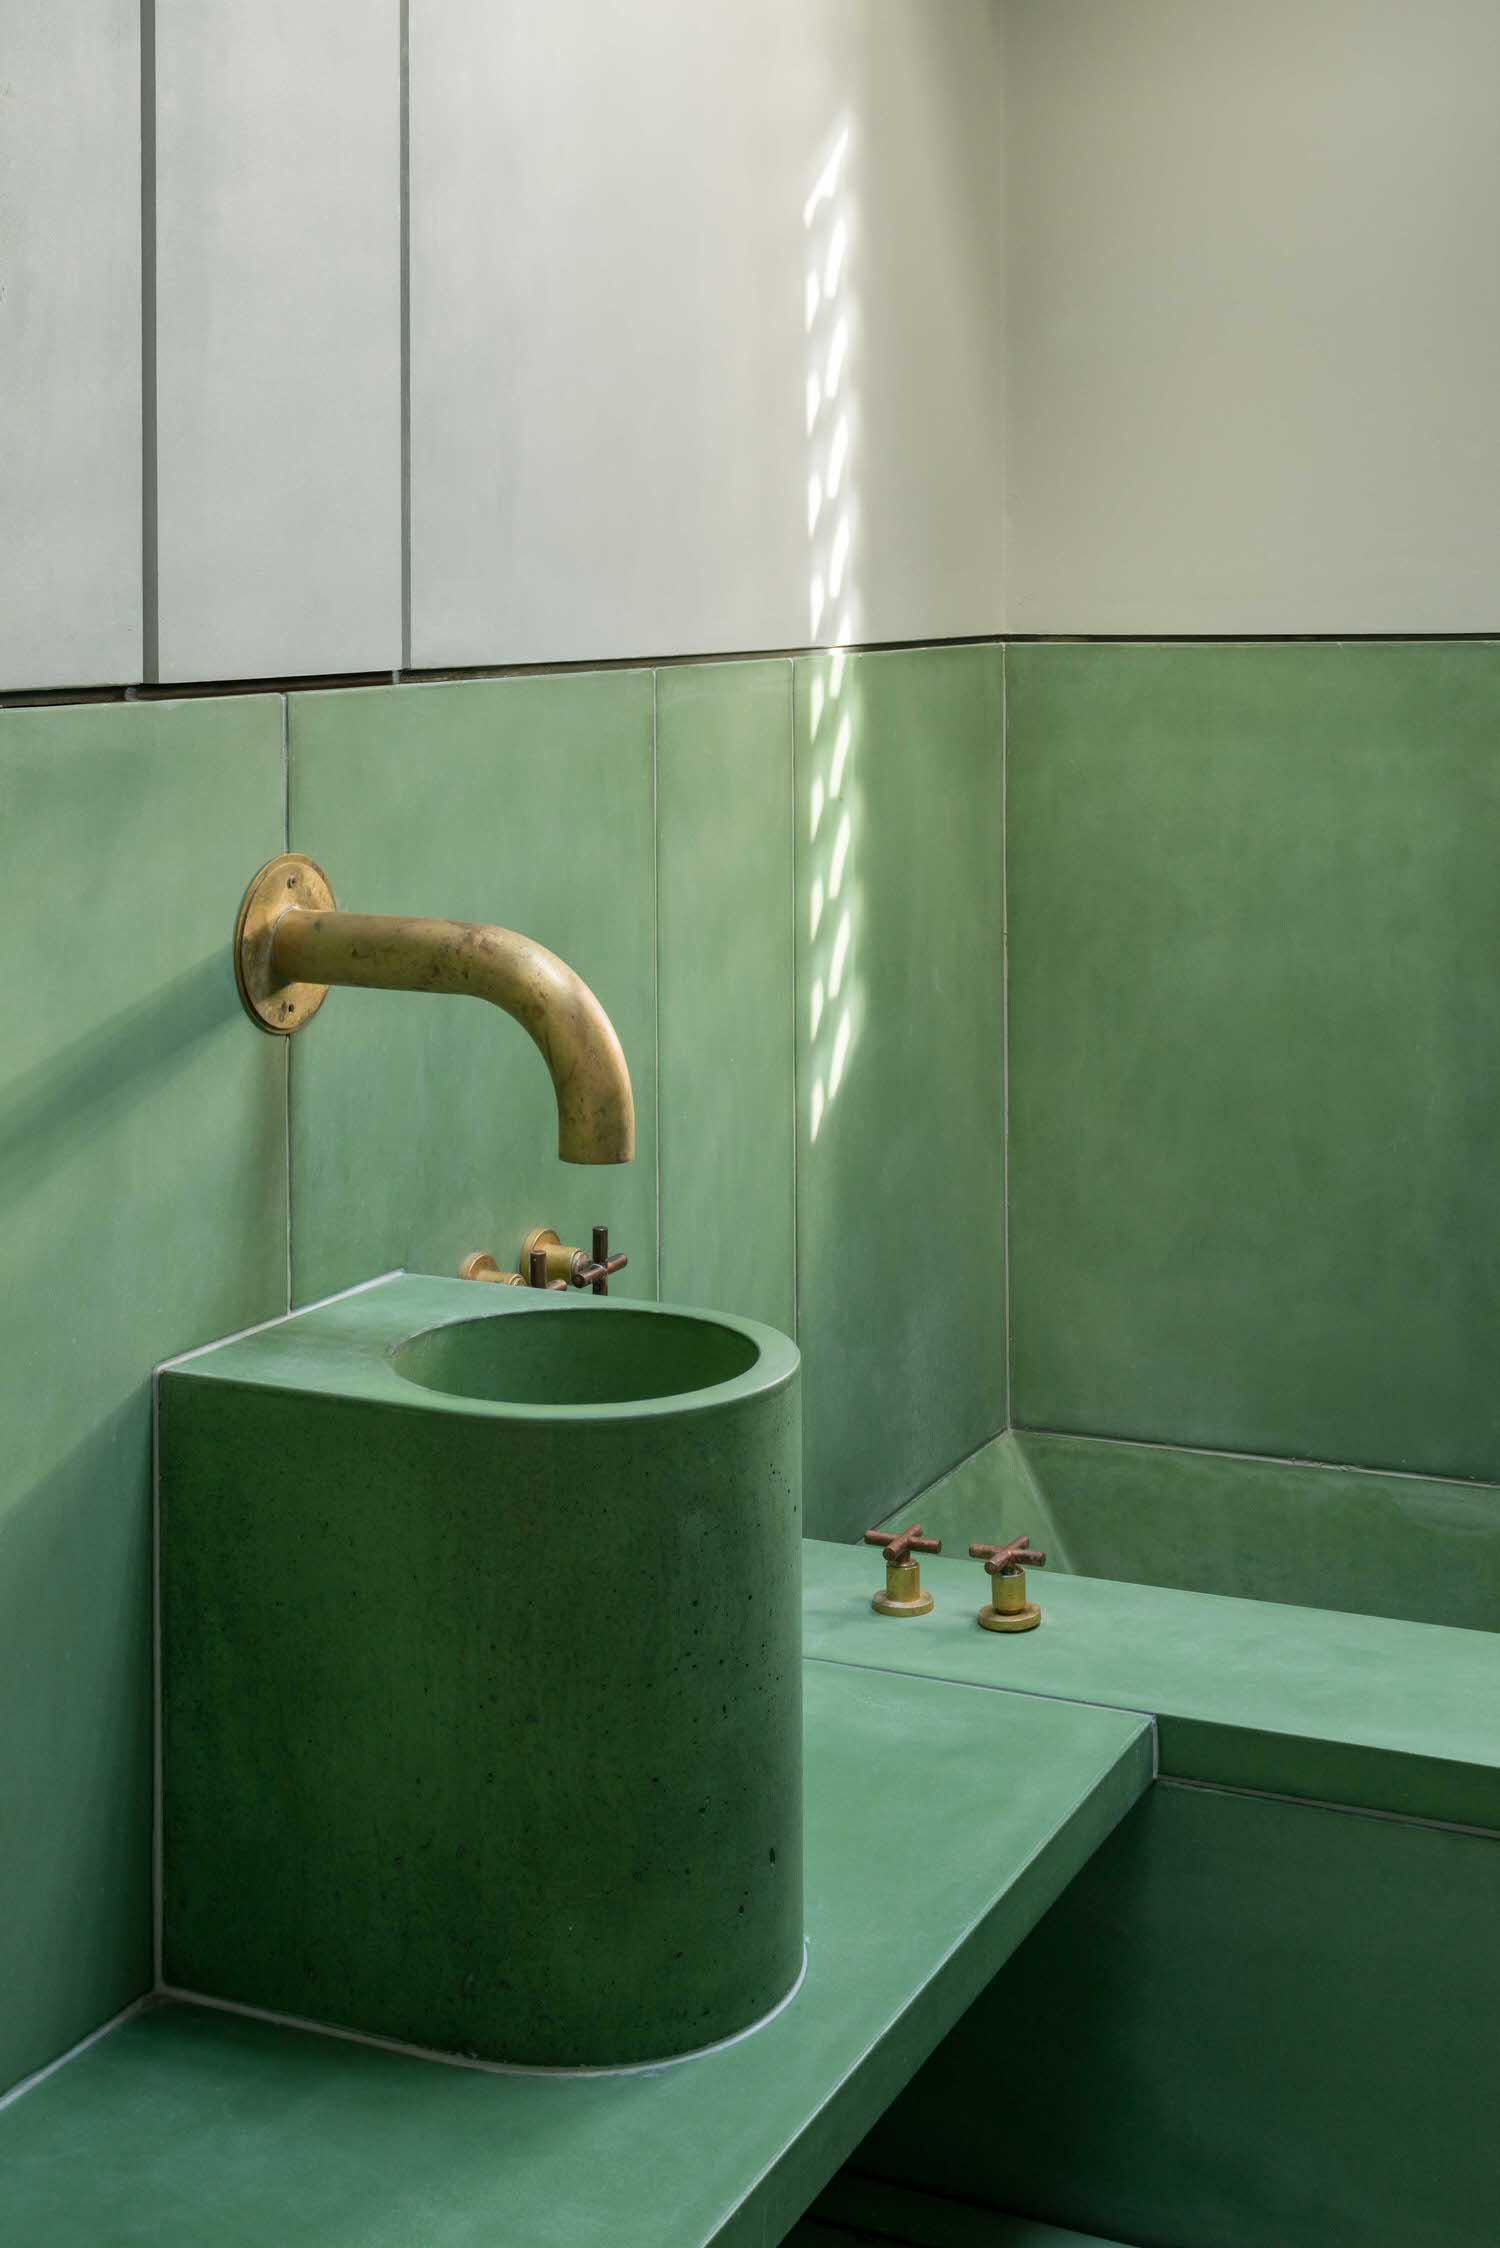 Studio Ben Allen House Recast London Residential Architecture Photo French+tye Yellowtrace 26